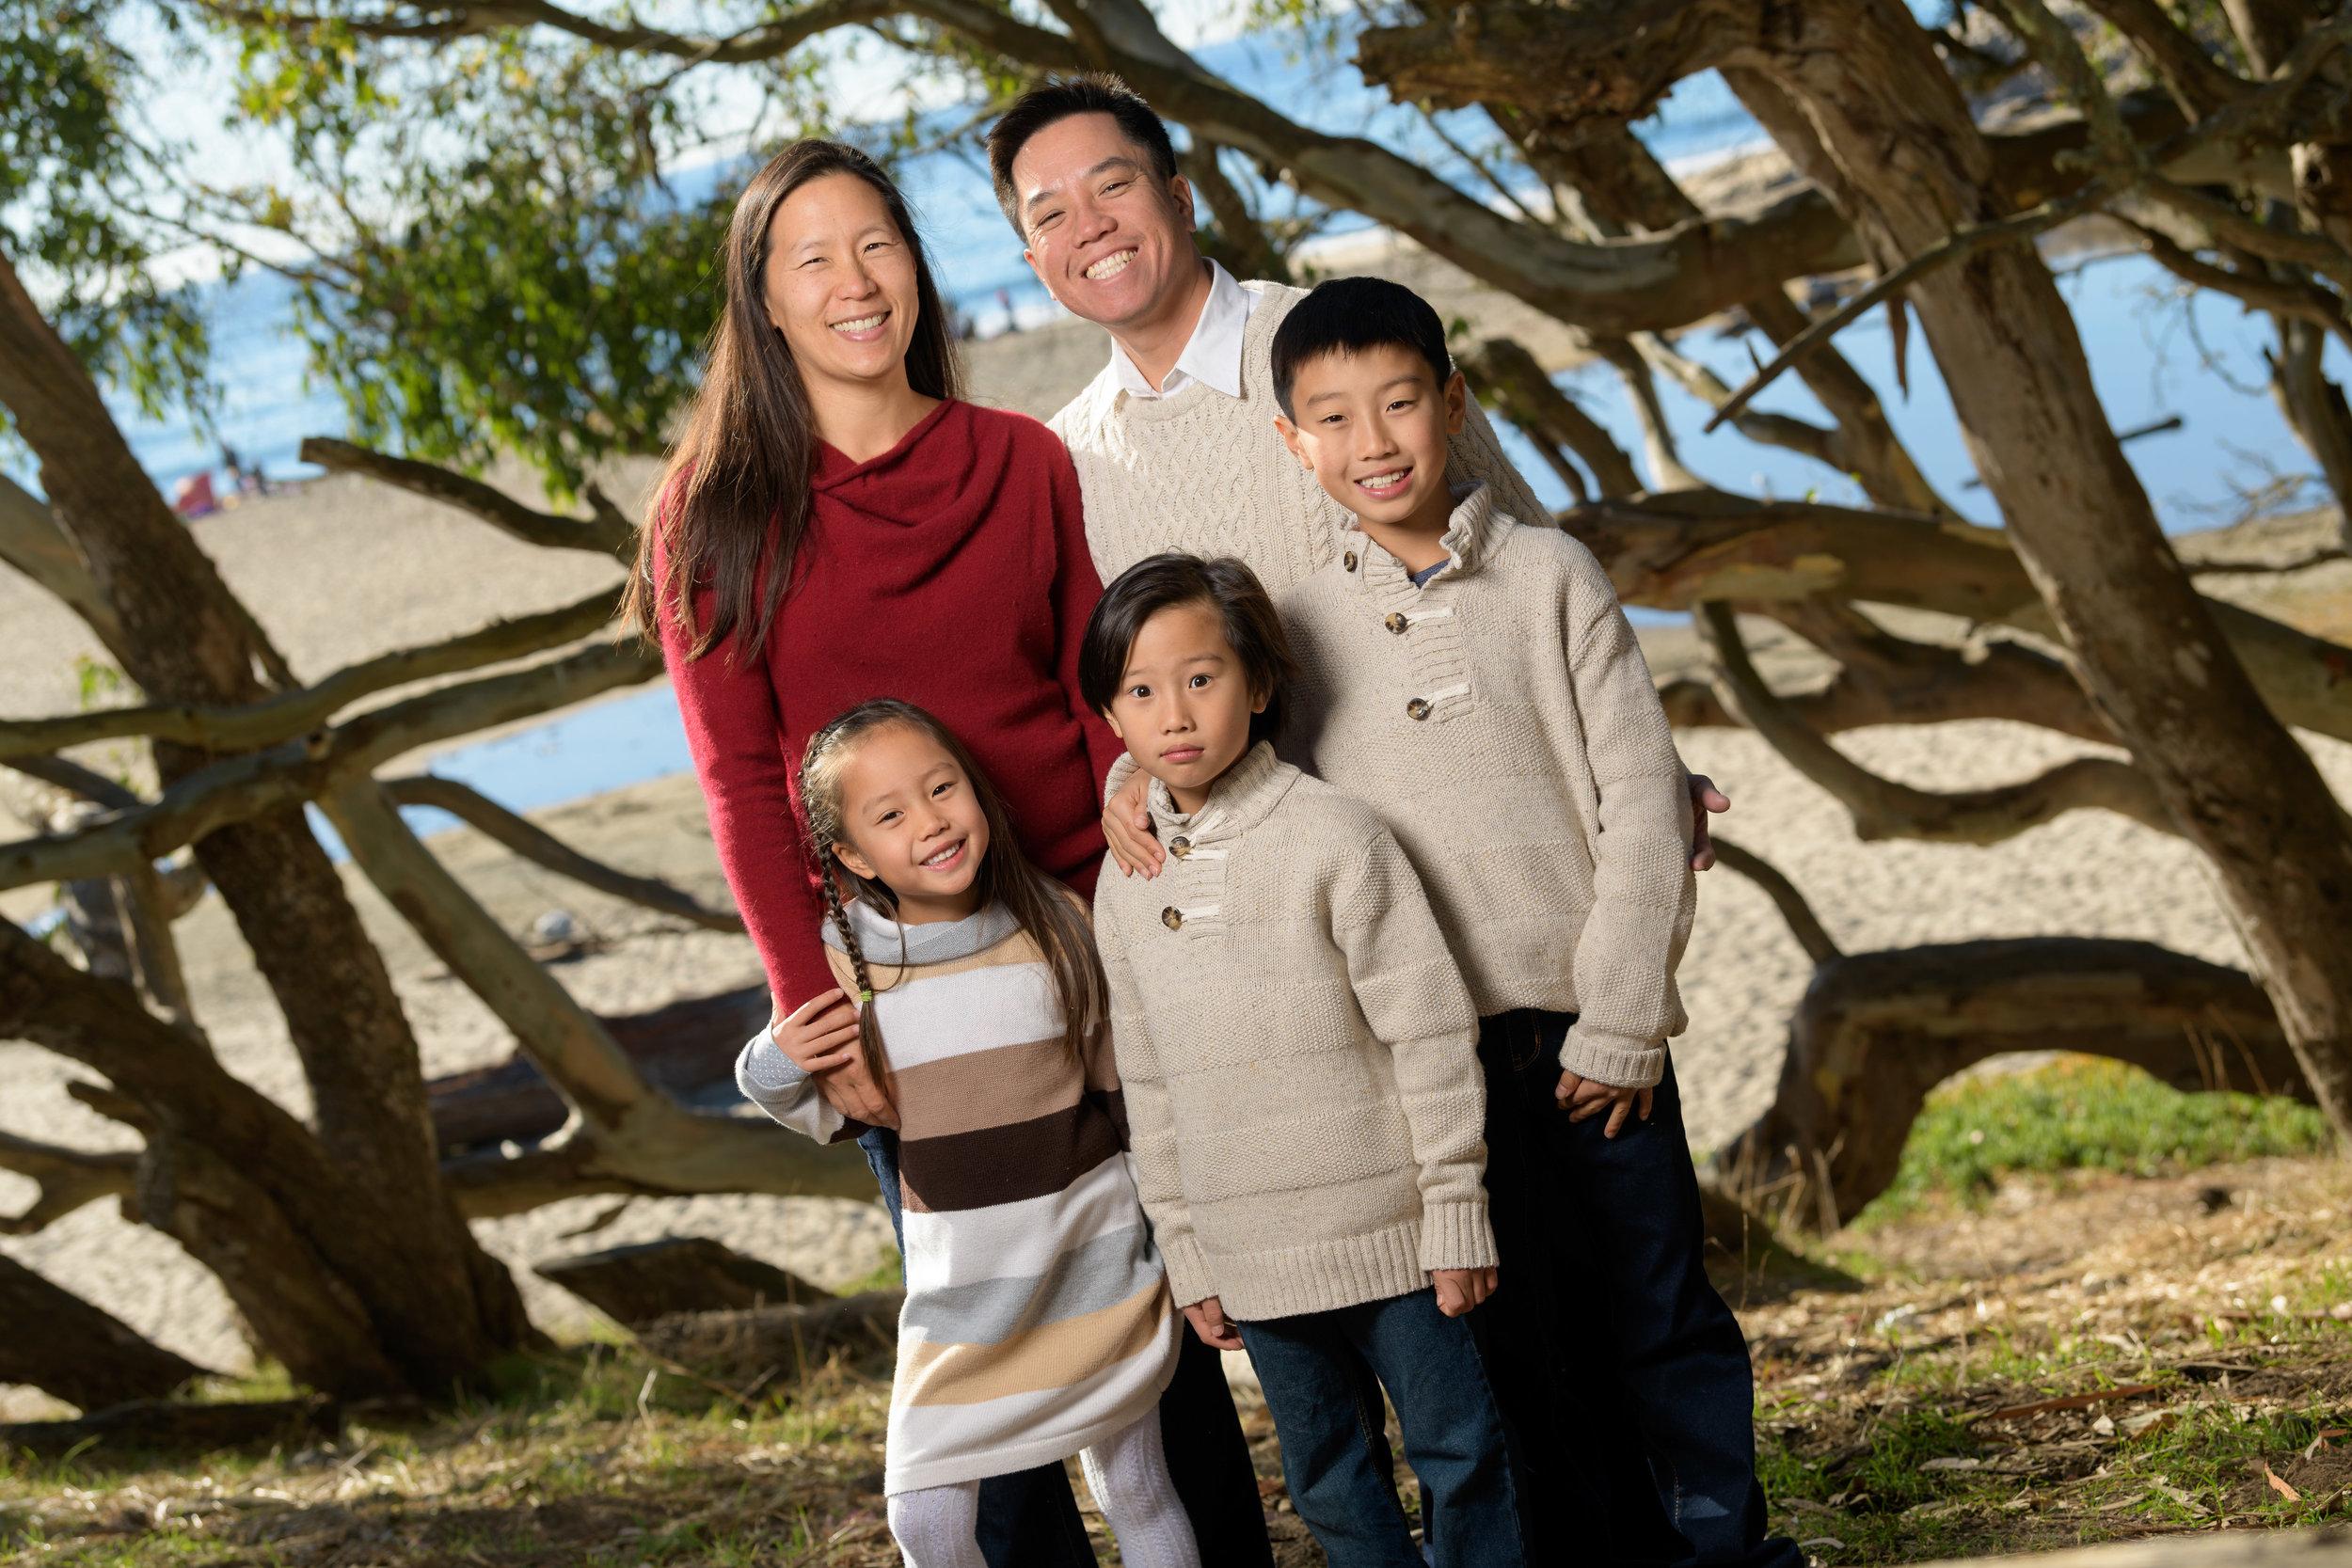 8761_Andrew_S_Natural_Bridges_Santa_Cruz_Family_Photography.jpg